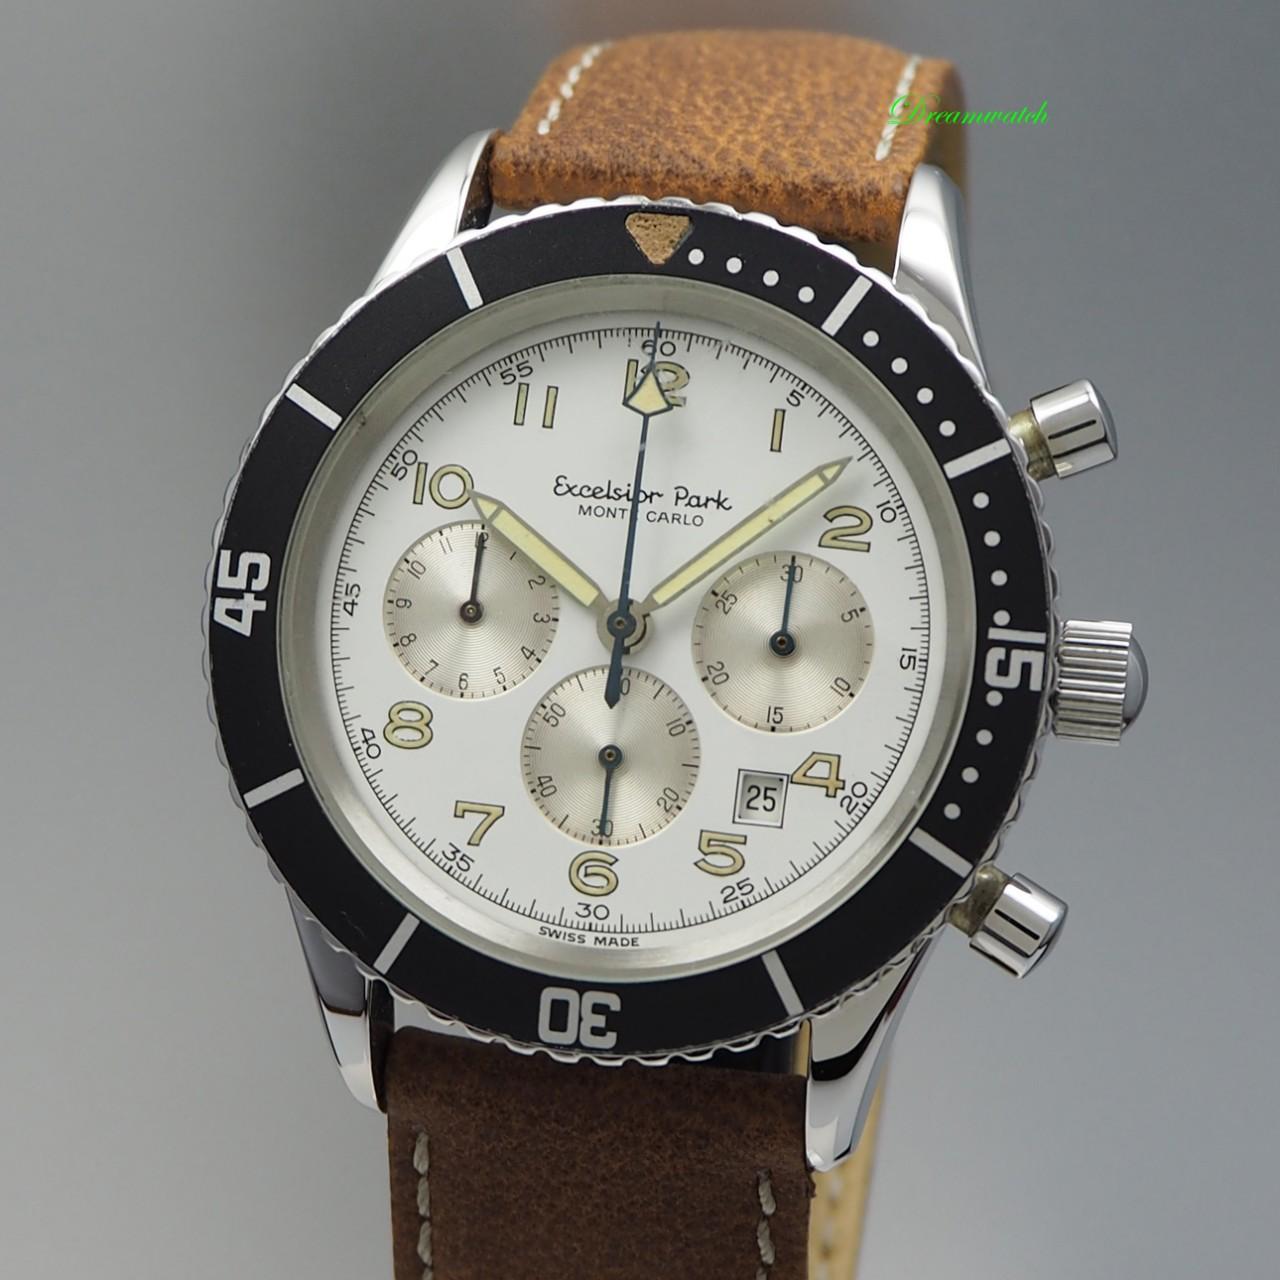 Excelsior Park Monte Carlo Vintage Chronograph Handaufzug Cal.7740